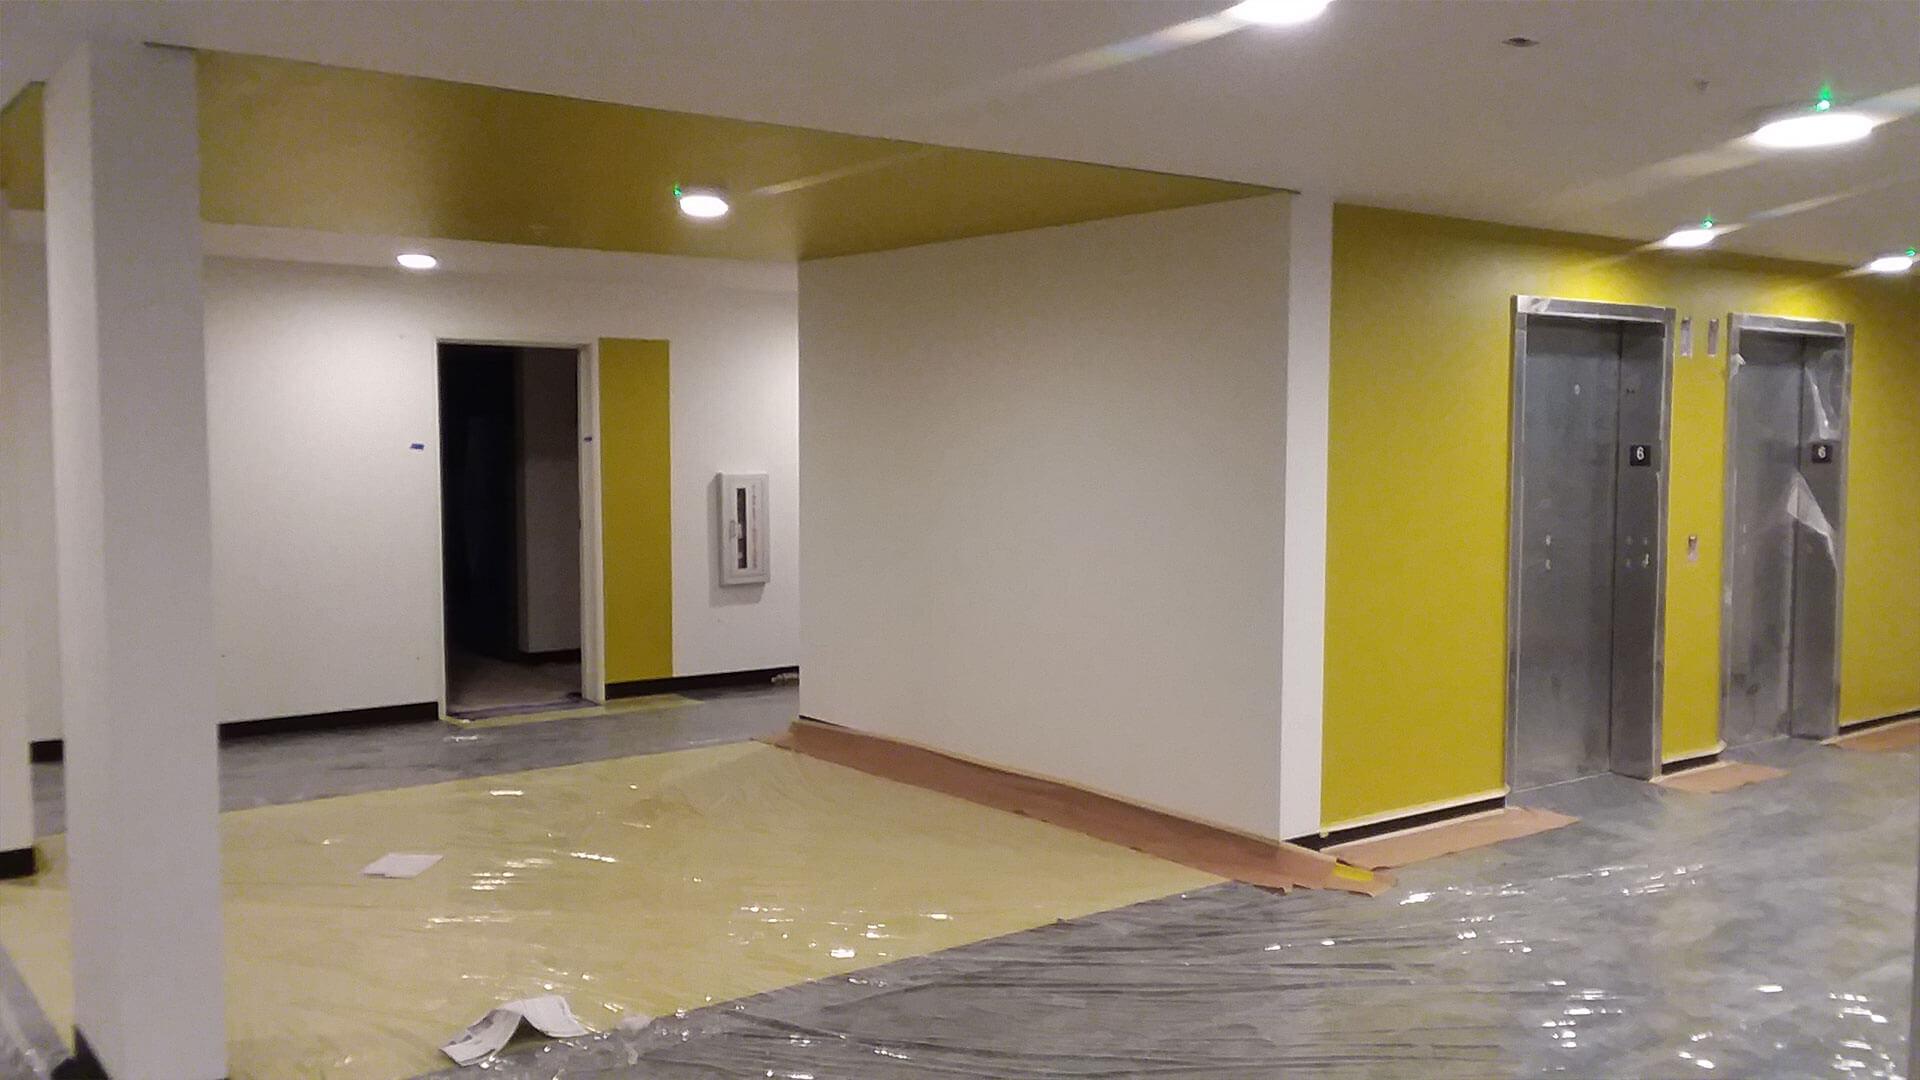 Elevators Under Construction at Stateside Apartments